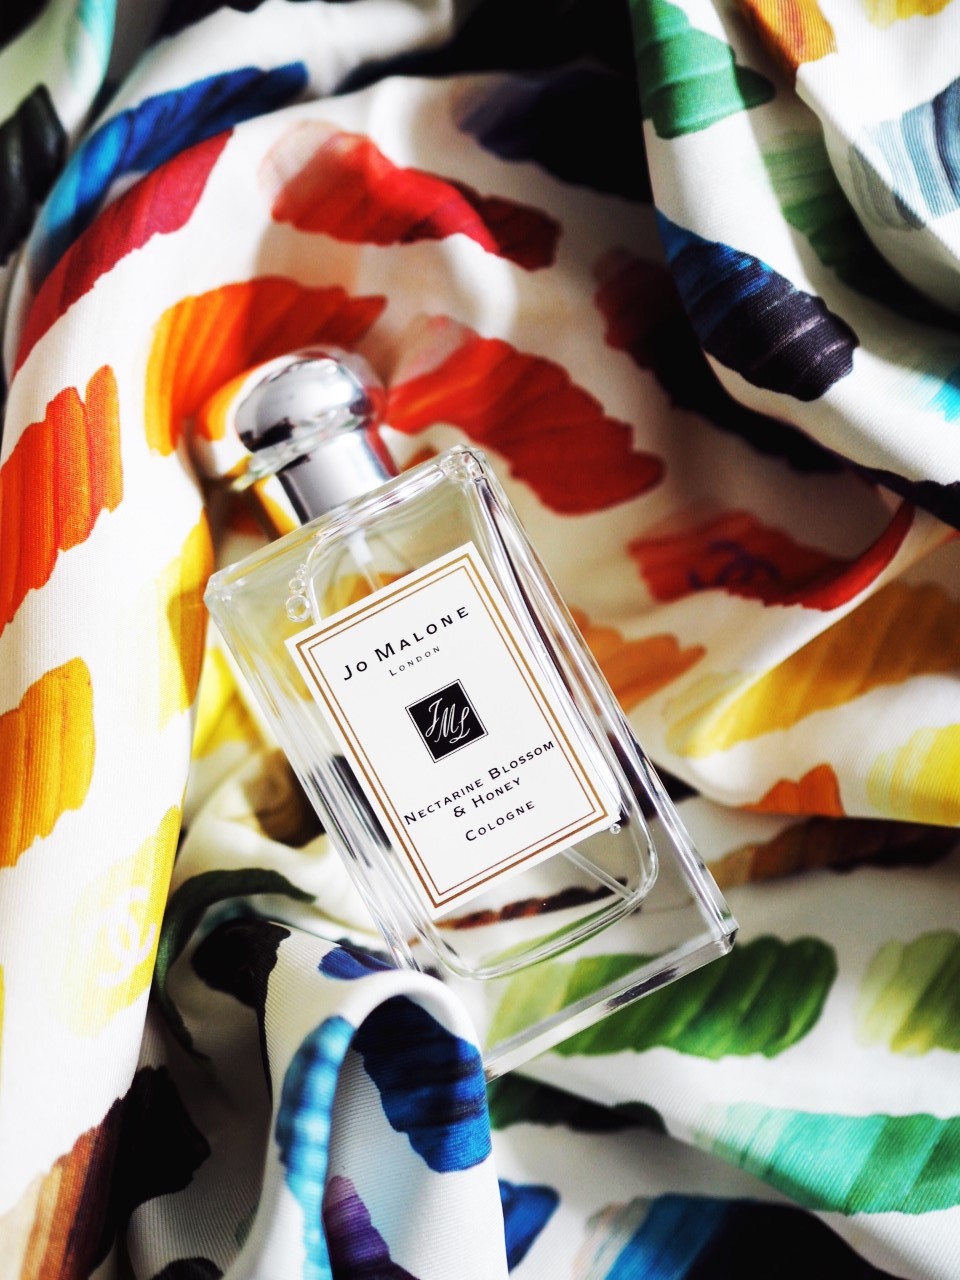 Jo Malone 'Nectarine Blossom & Honey' Cologne Review 2021 wedding